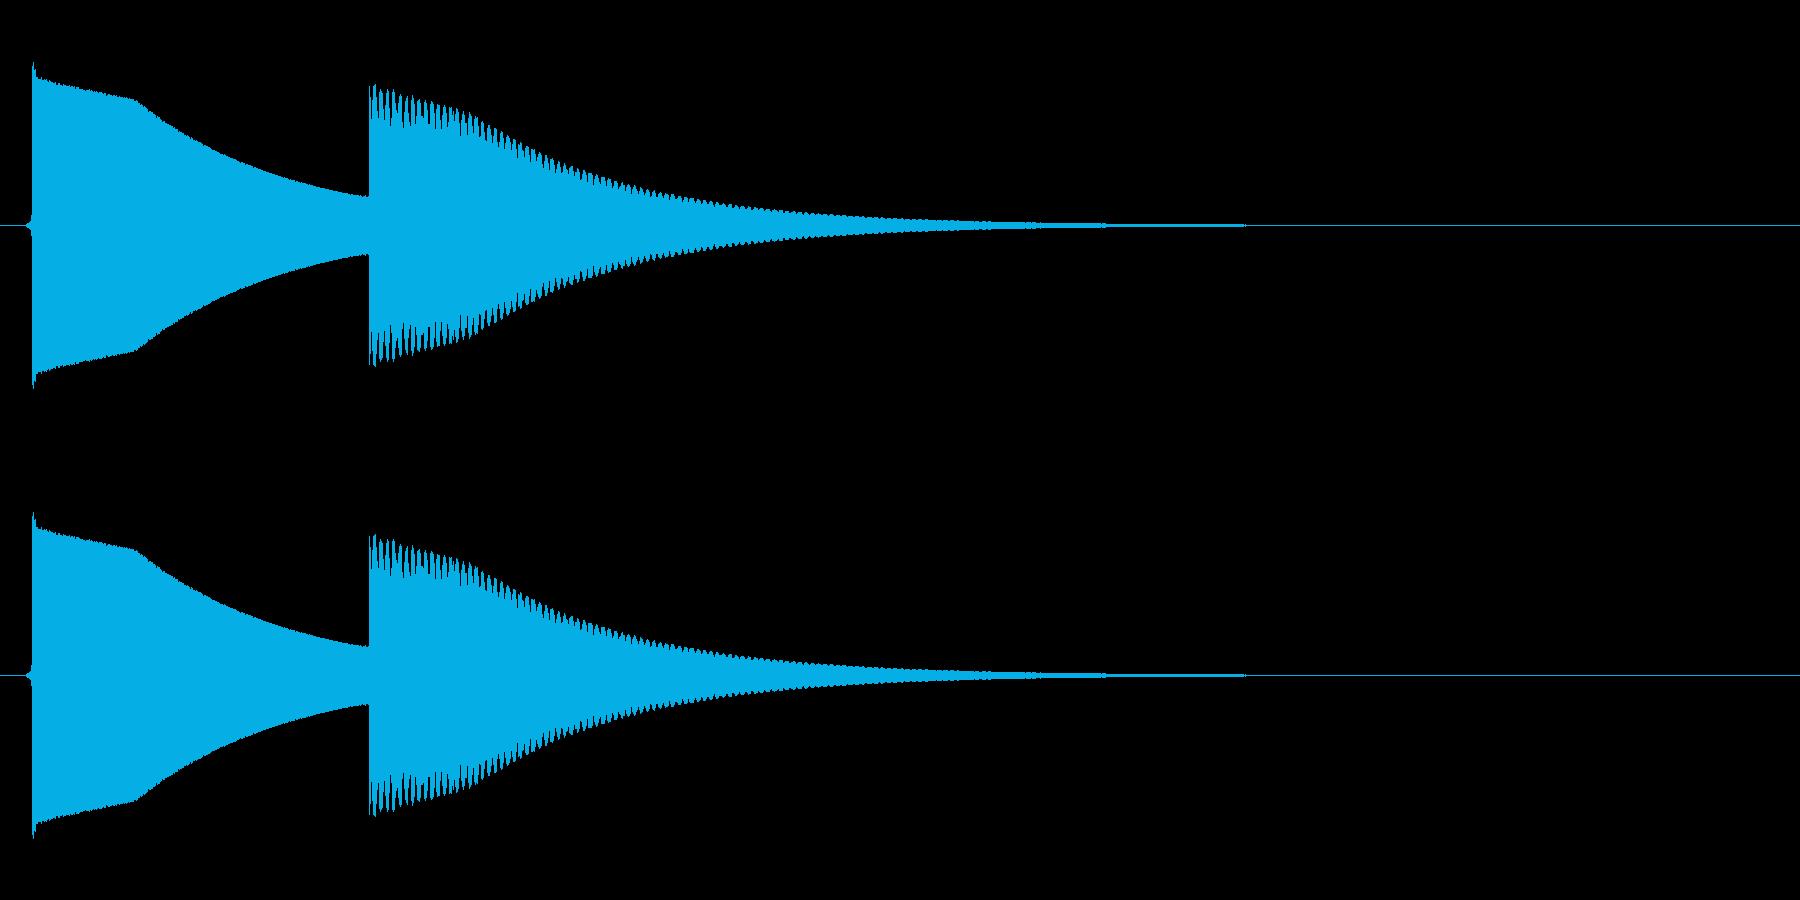 【SE】正解04(ピンポーン 長め)の再生済みの波形